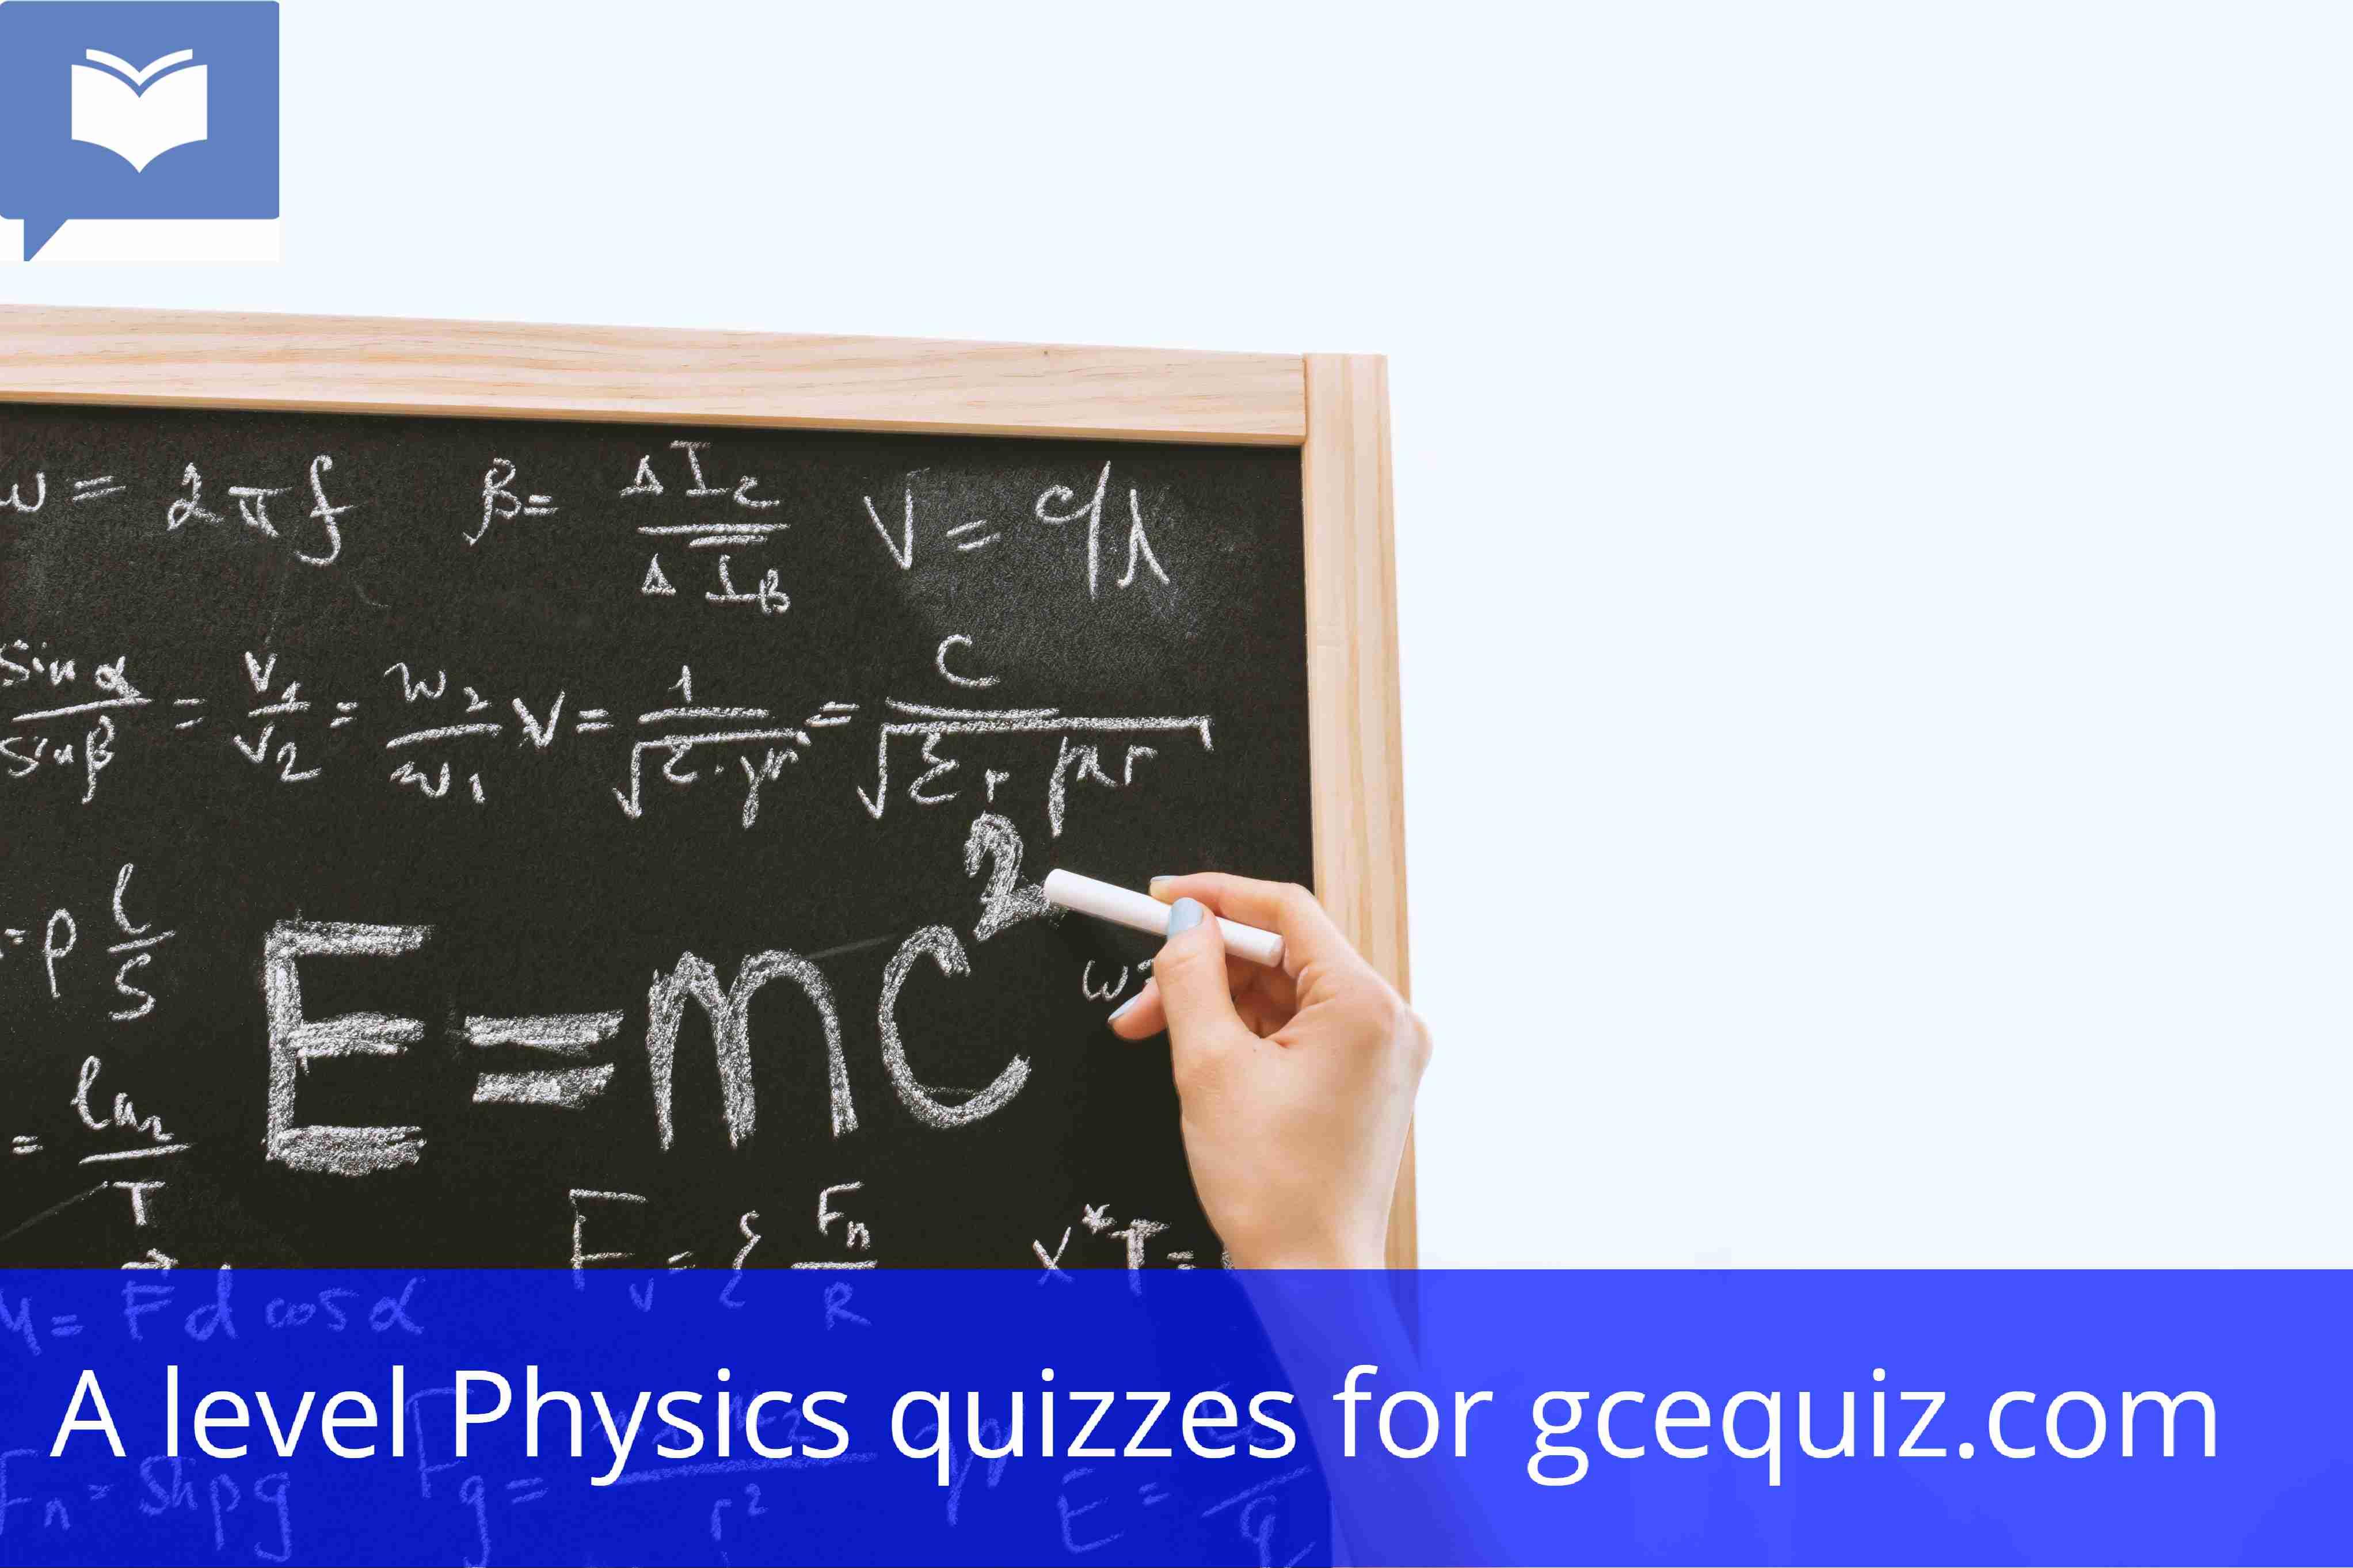 A level Physics Quizzes